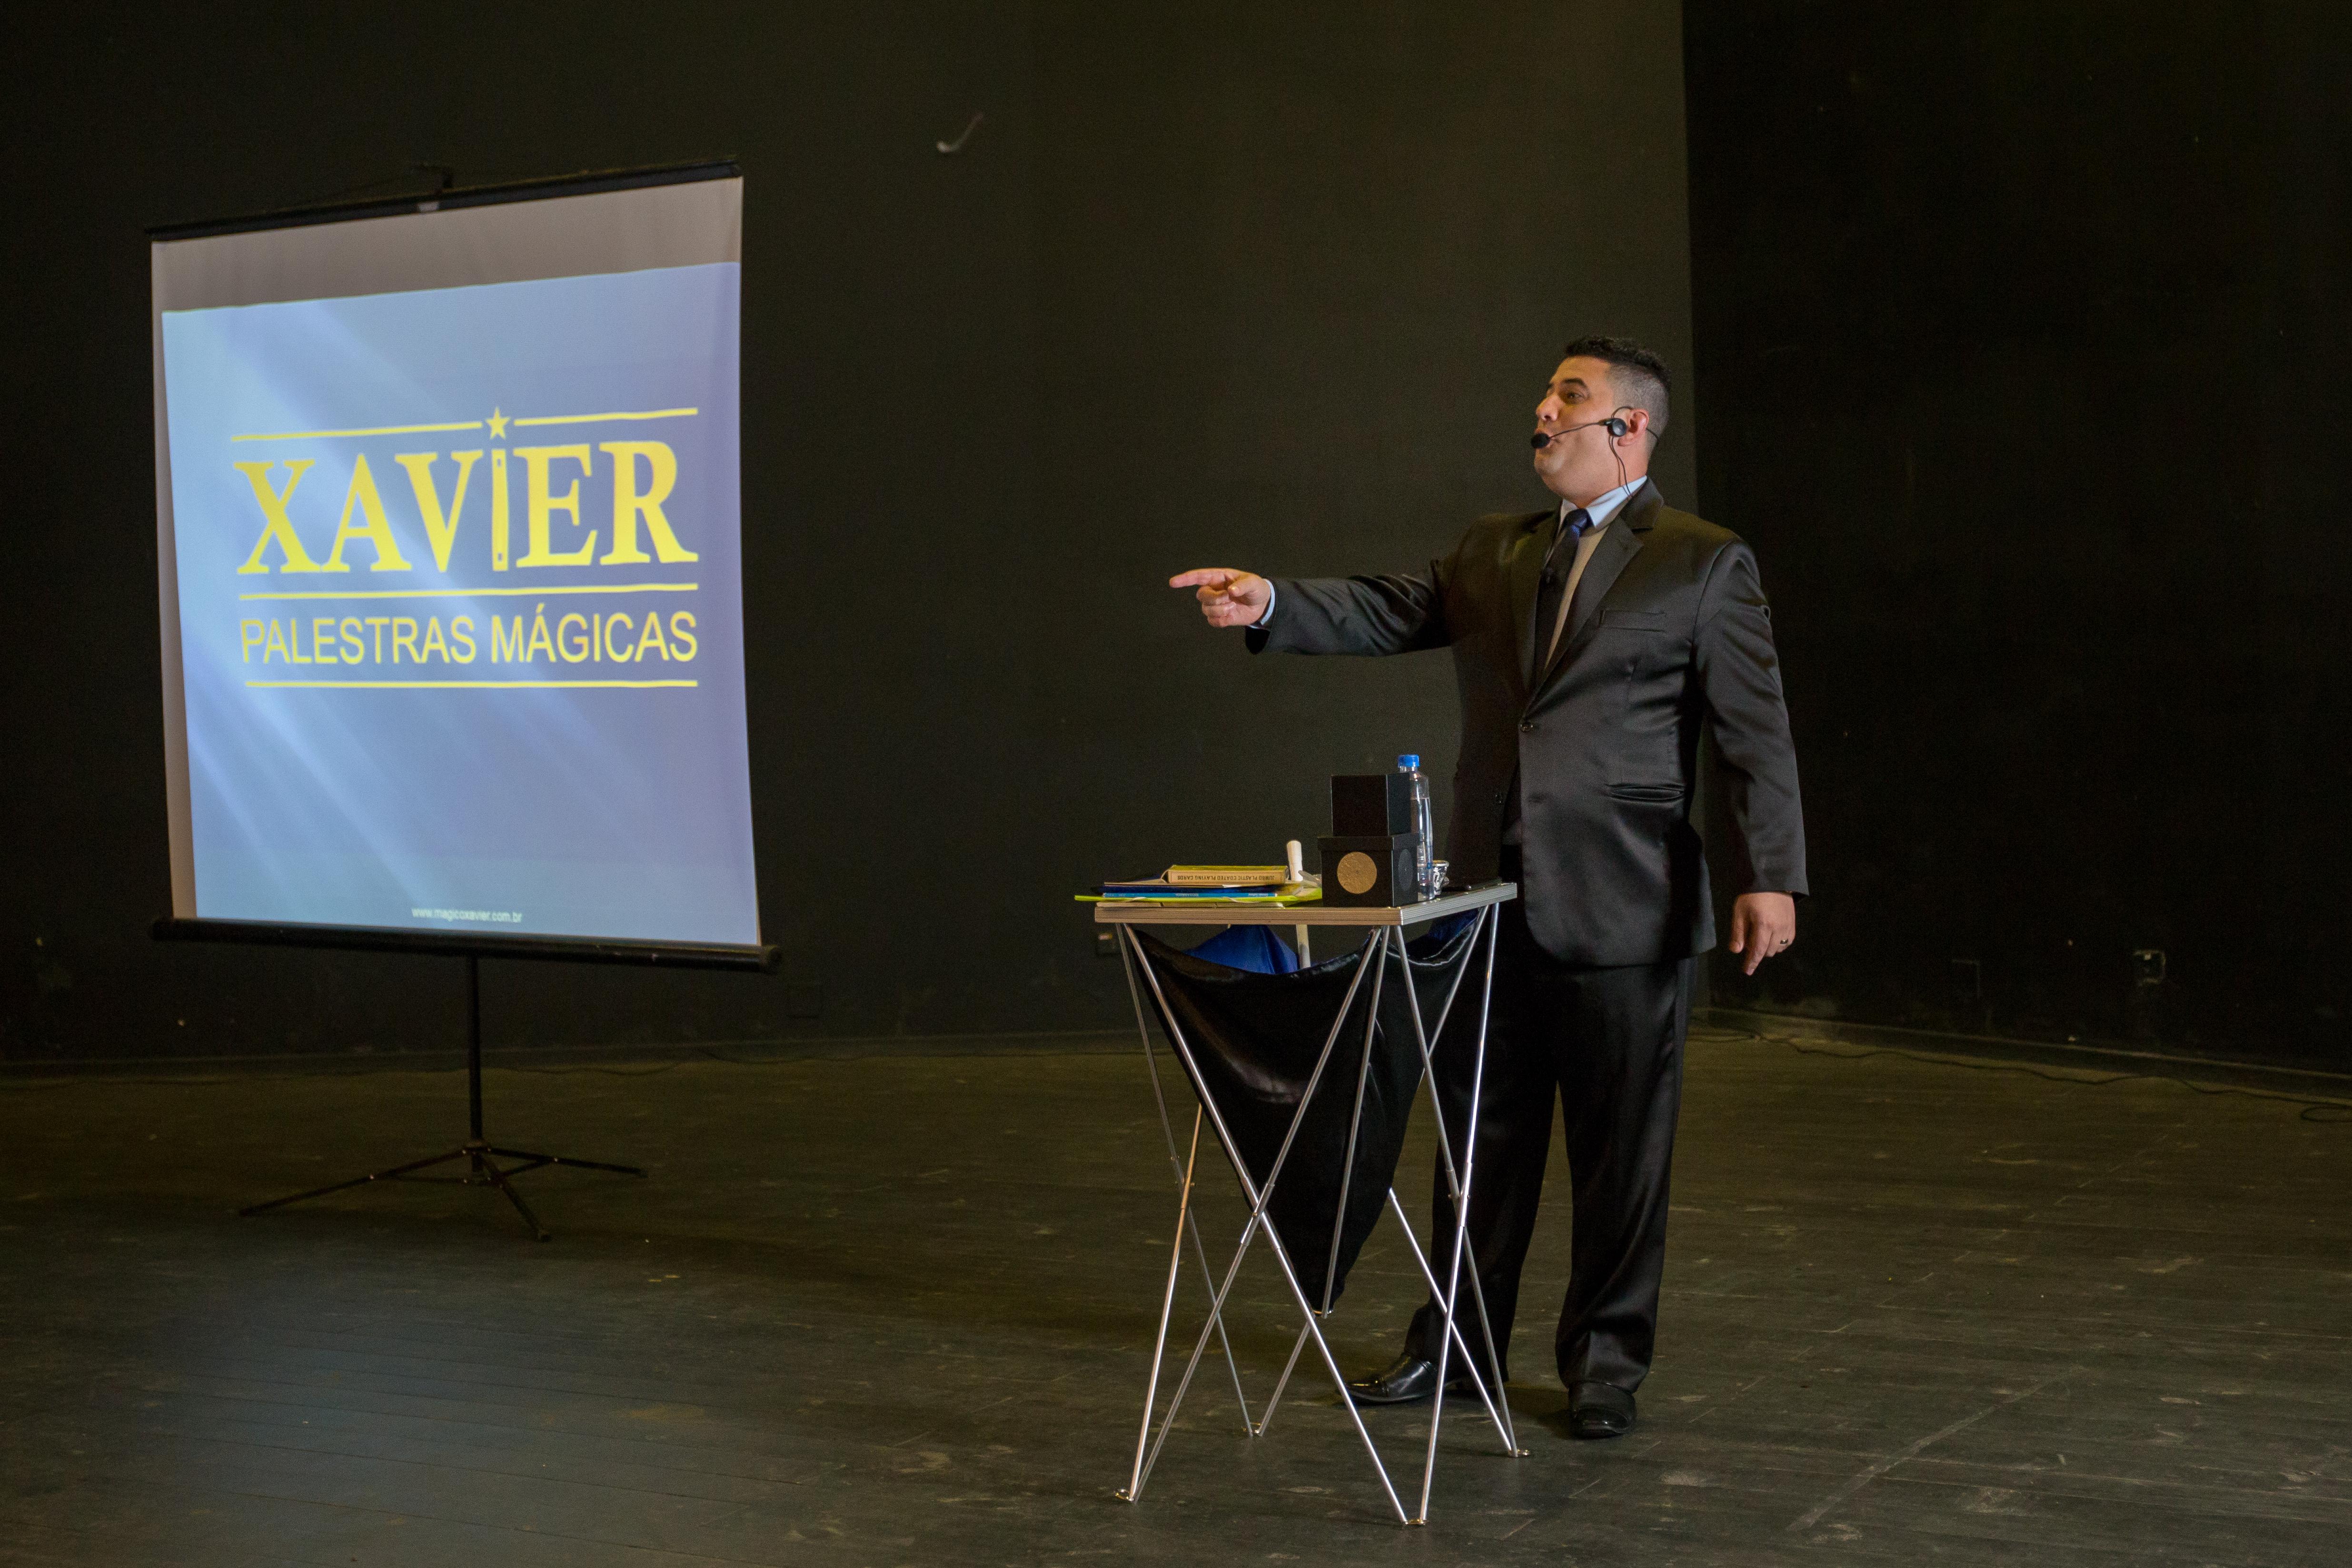 Palestra Motivacional Para Empresas Palestrante Xavier